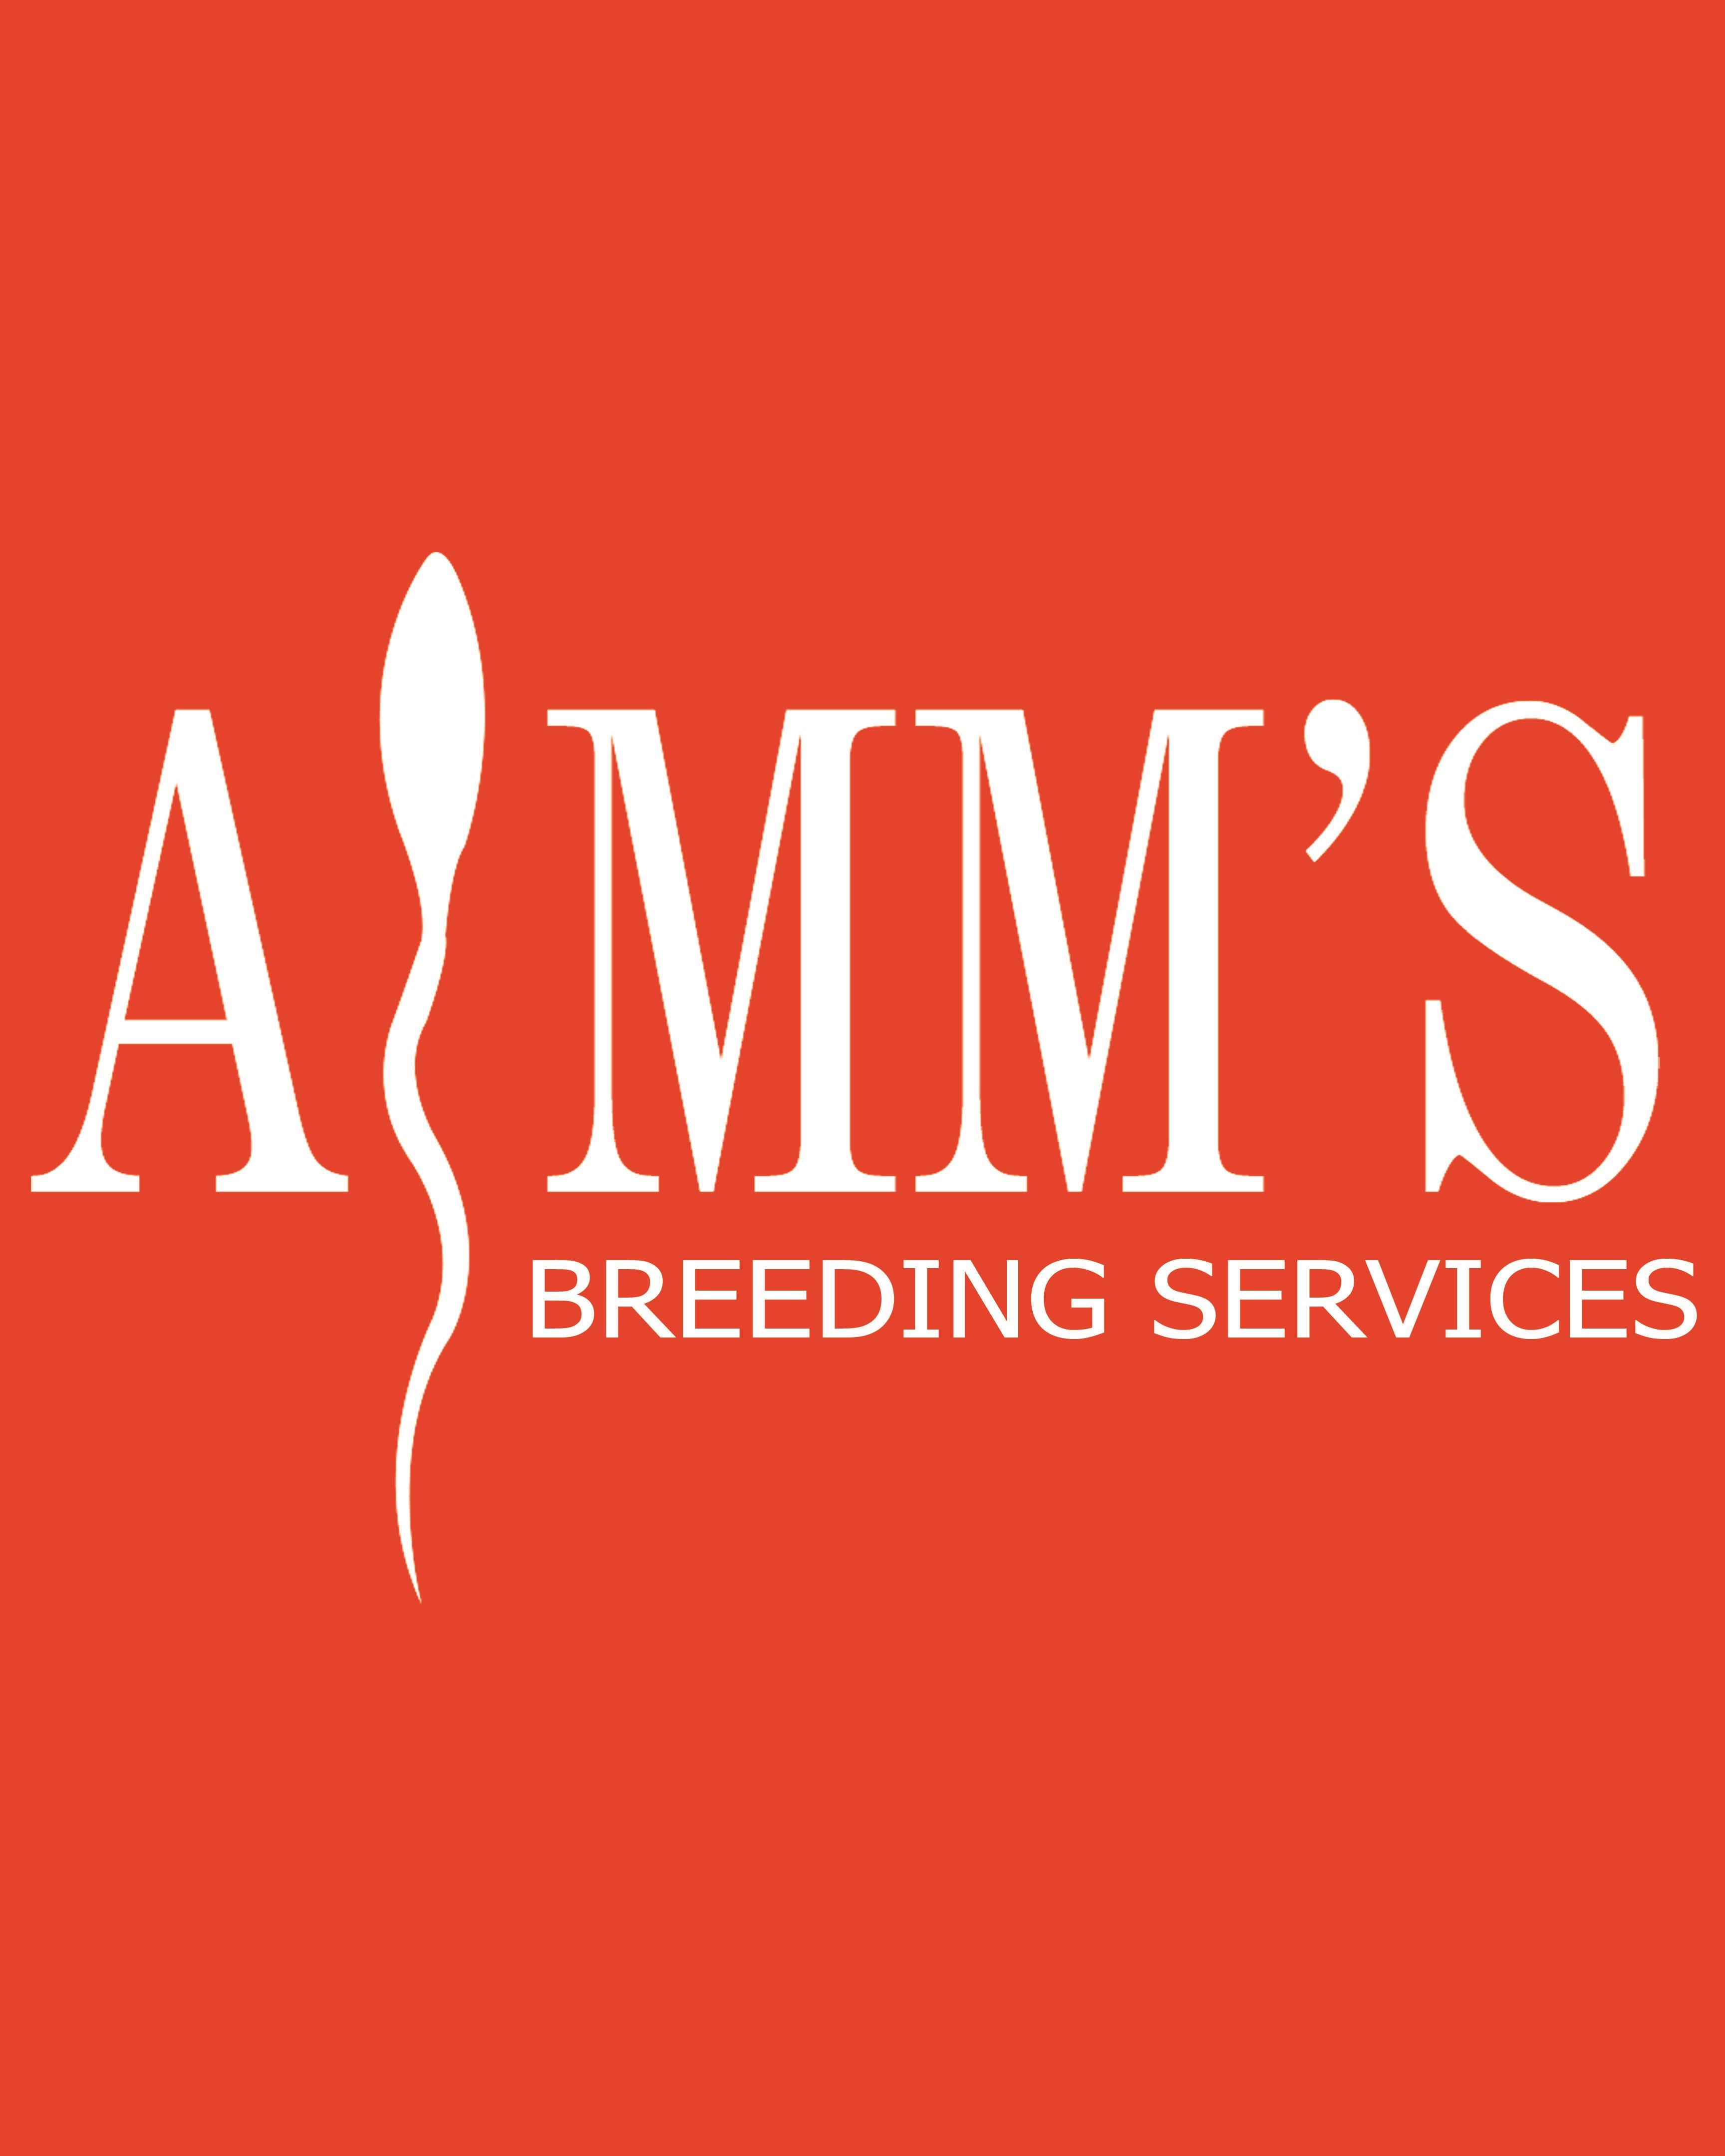 AIMM'S Breeding Services